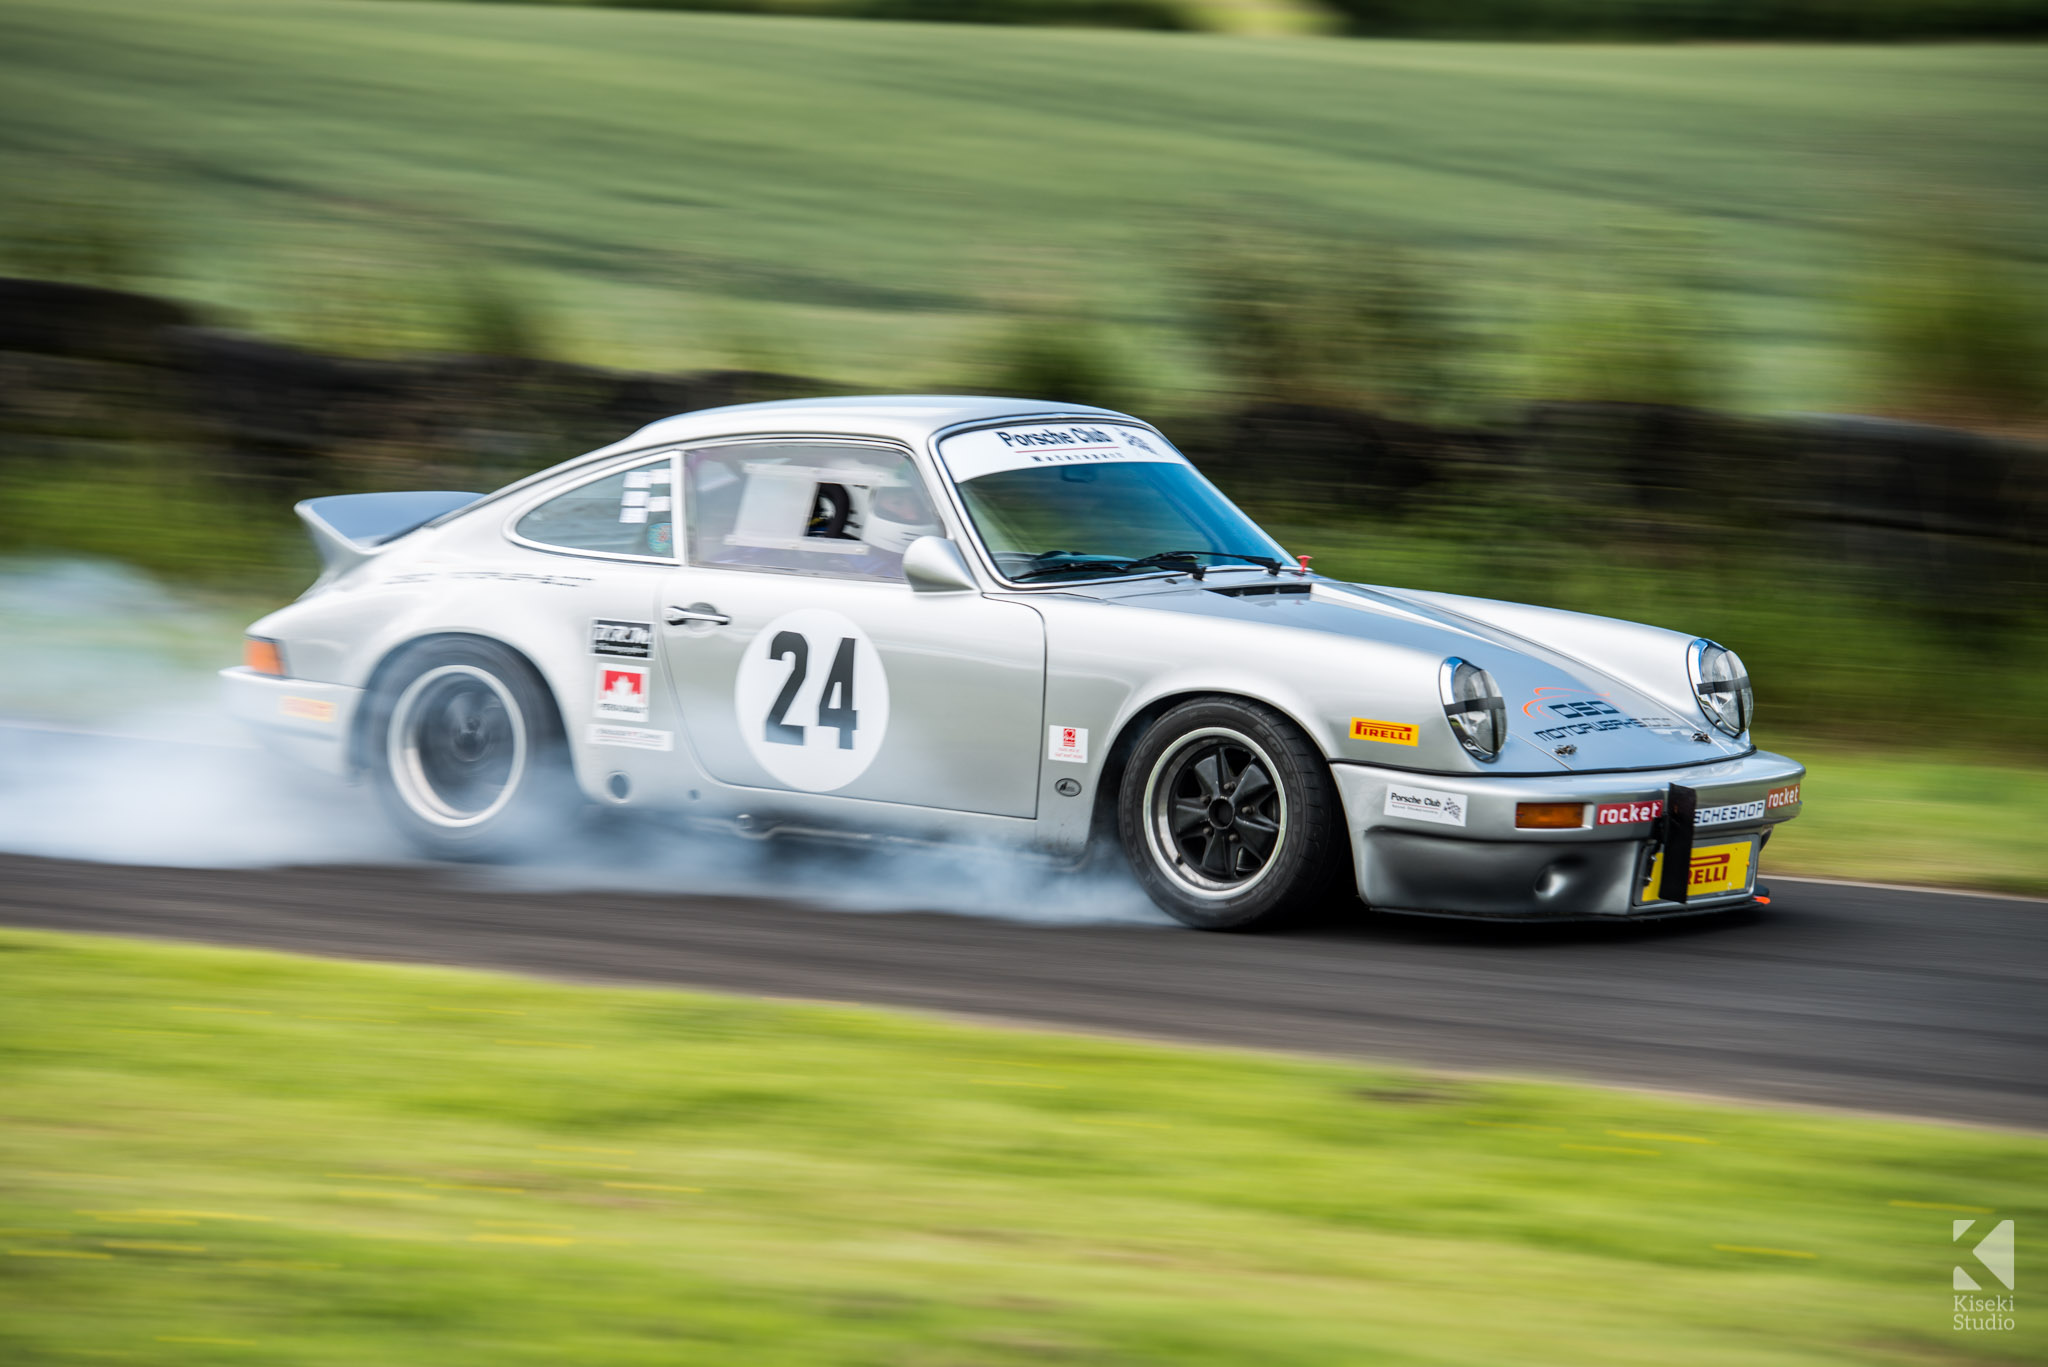 porsche-911-carrera-930-harewood-speed-hillclimb-braking-locked-up